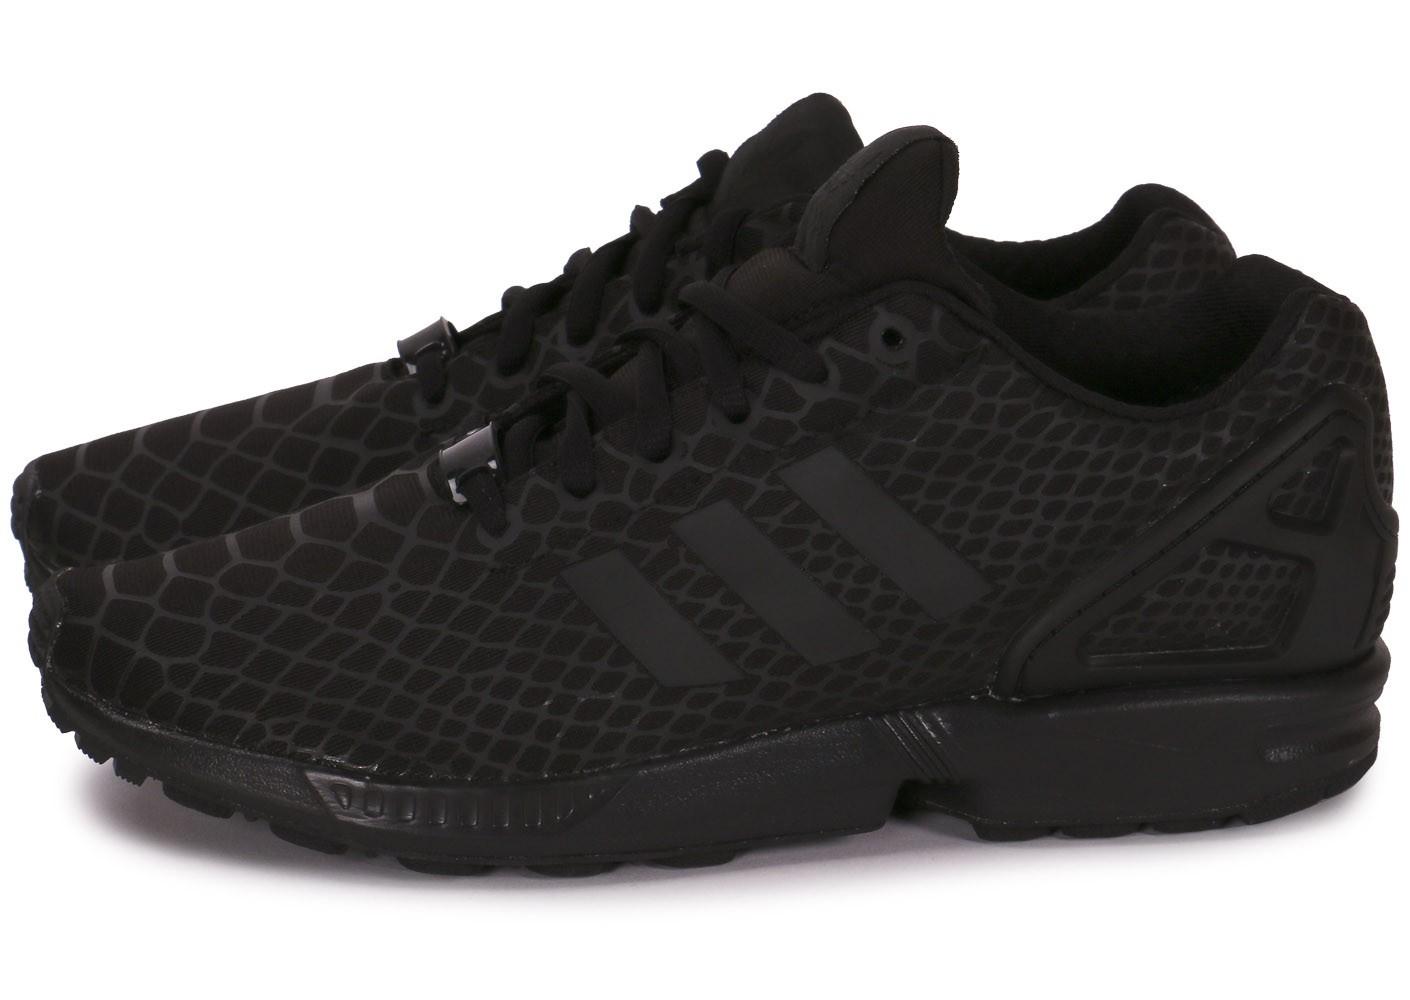 chaussure adidas zx flux noir homme